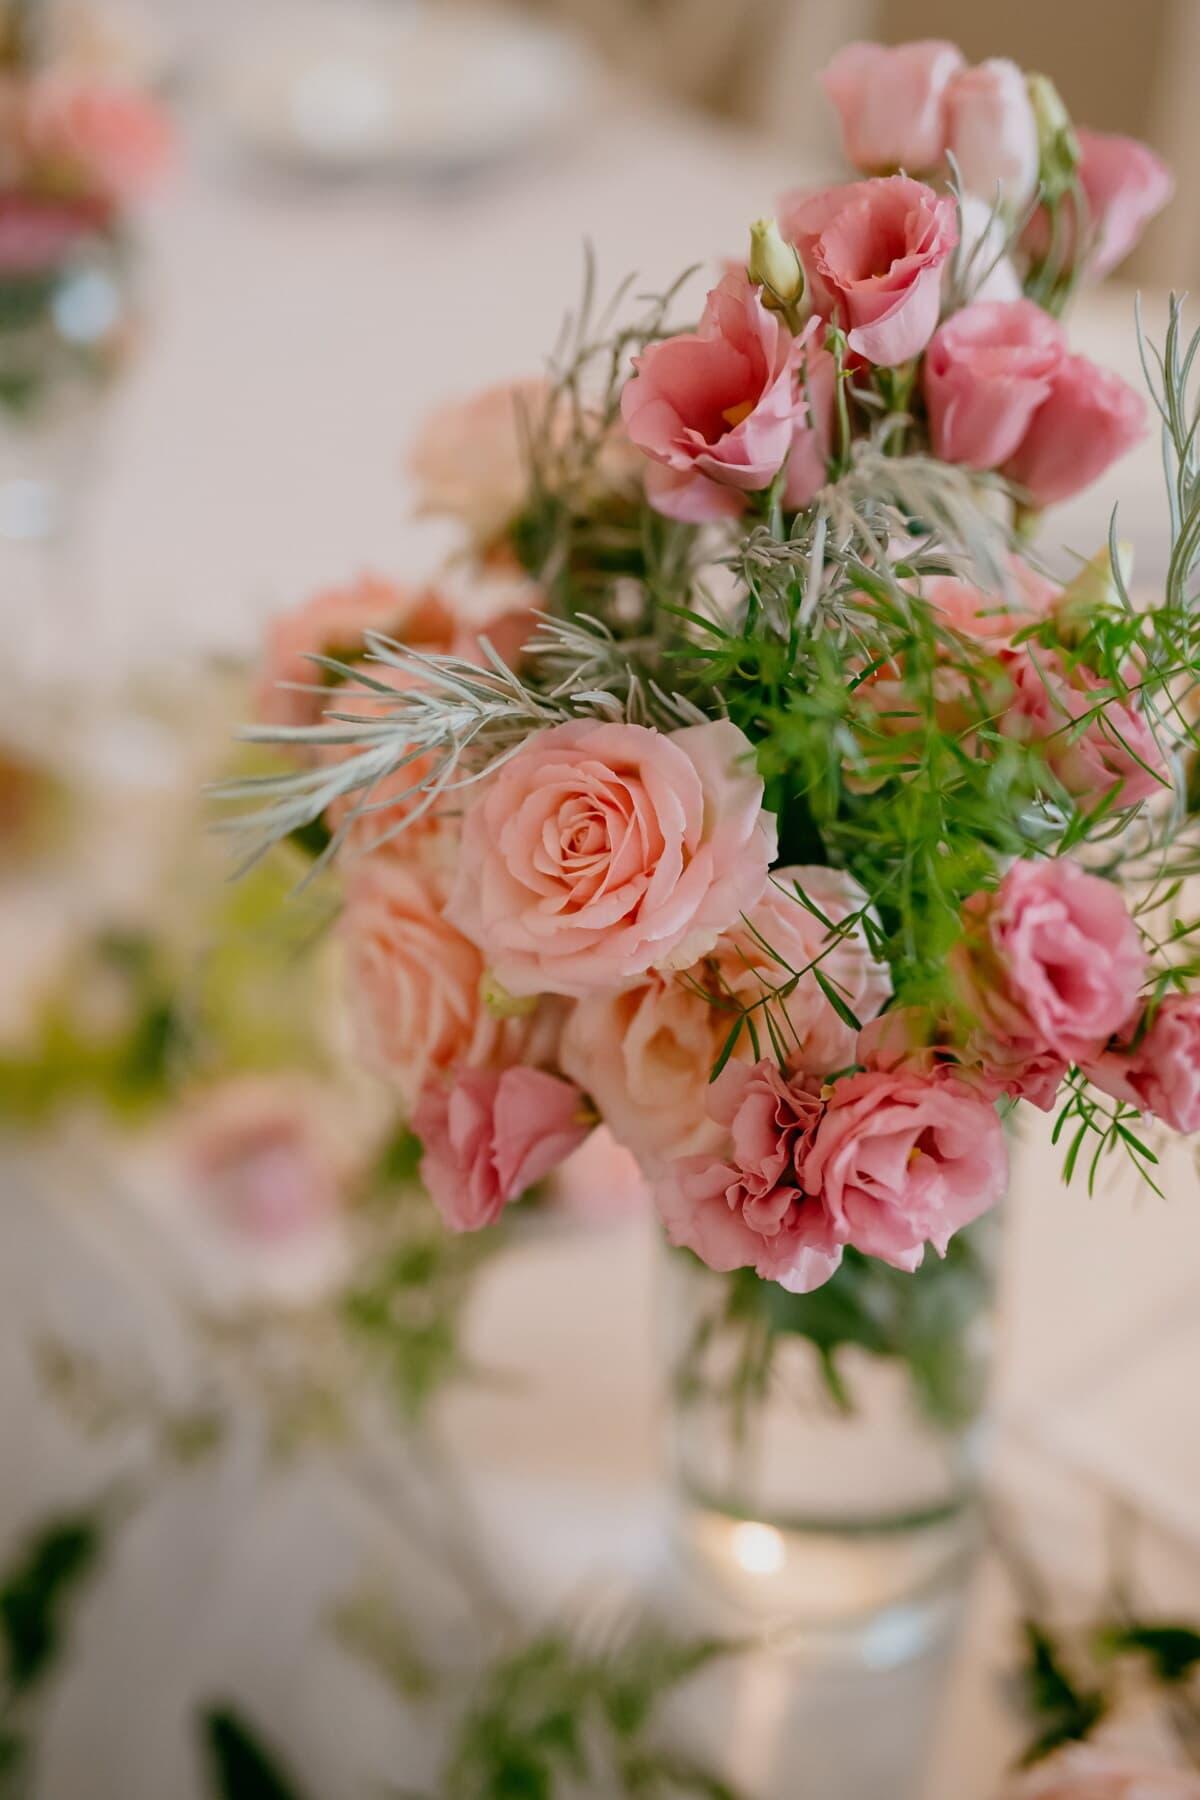 Nelke, Rosa, Pastell, Rosen, Blumenstrauß, Vase, Rosa, Romantik, Anordnung, stieg